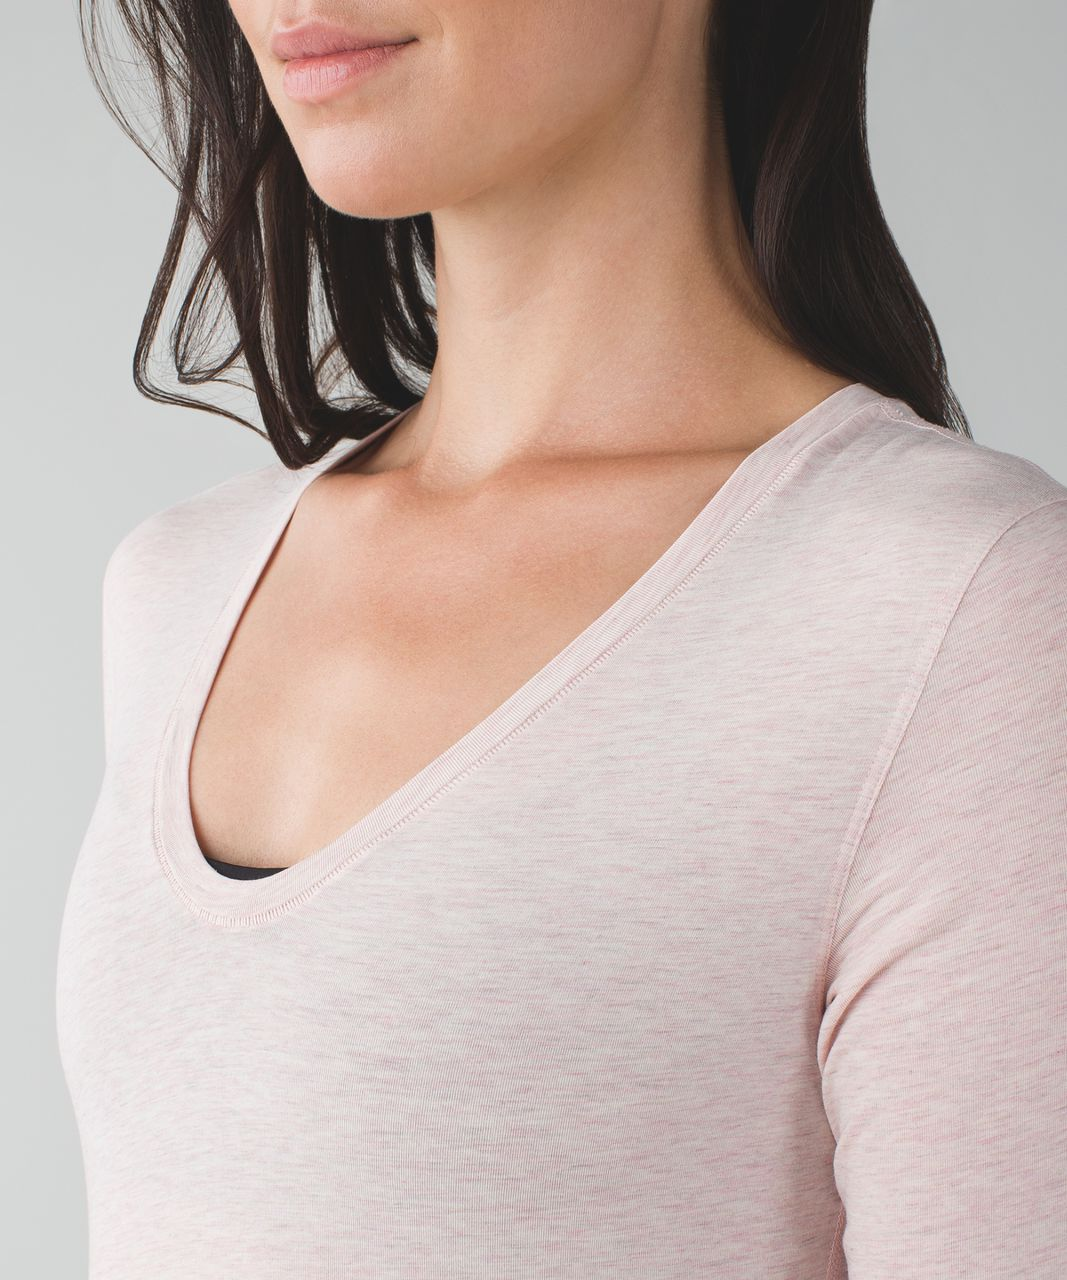 Lululemon Circadian Long Sleeve V Neck Tee - Heathered Mink Berry